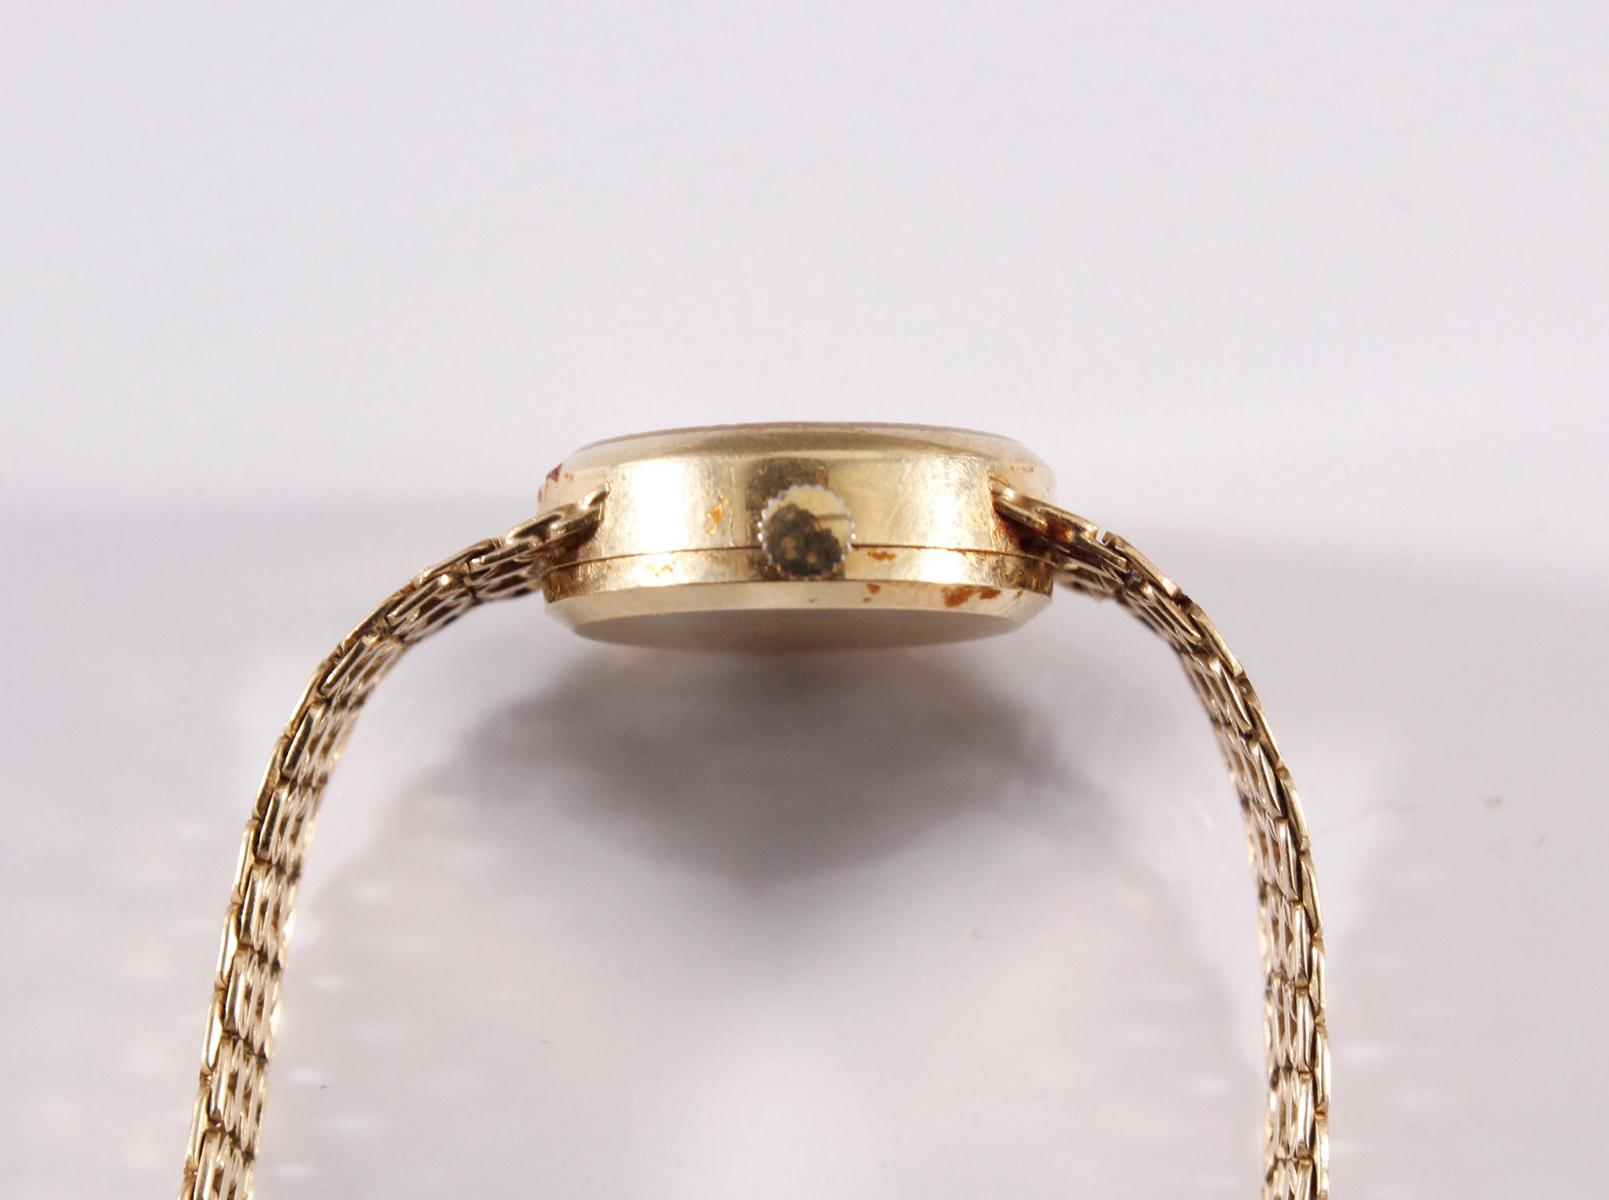 Damenarmbanduhr der Marke Sertina, 14 kt Gelbgold-3